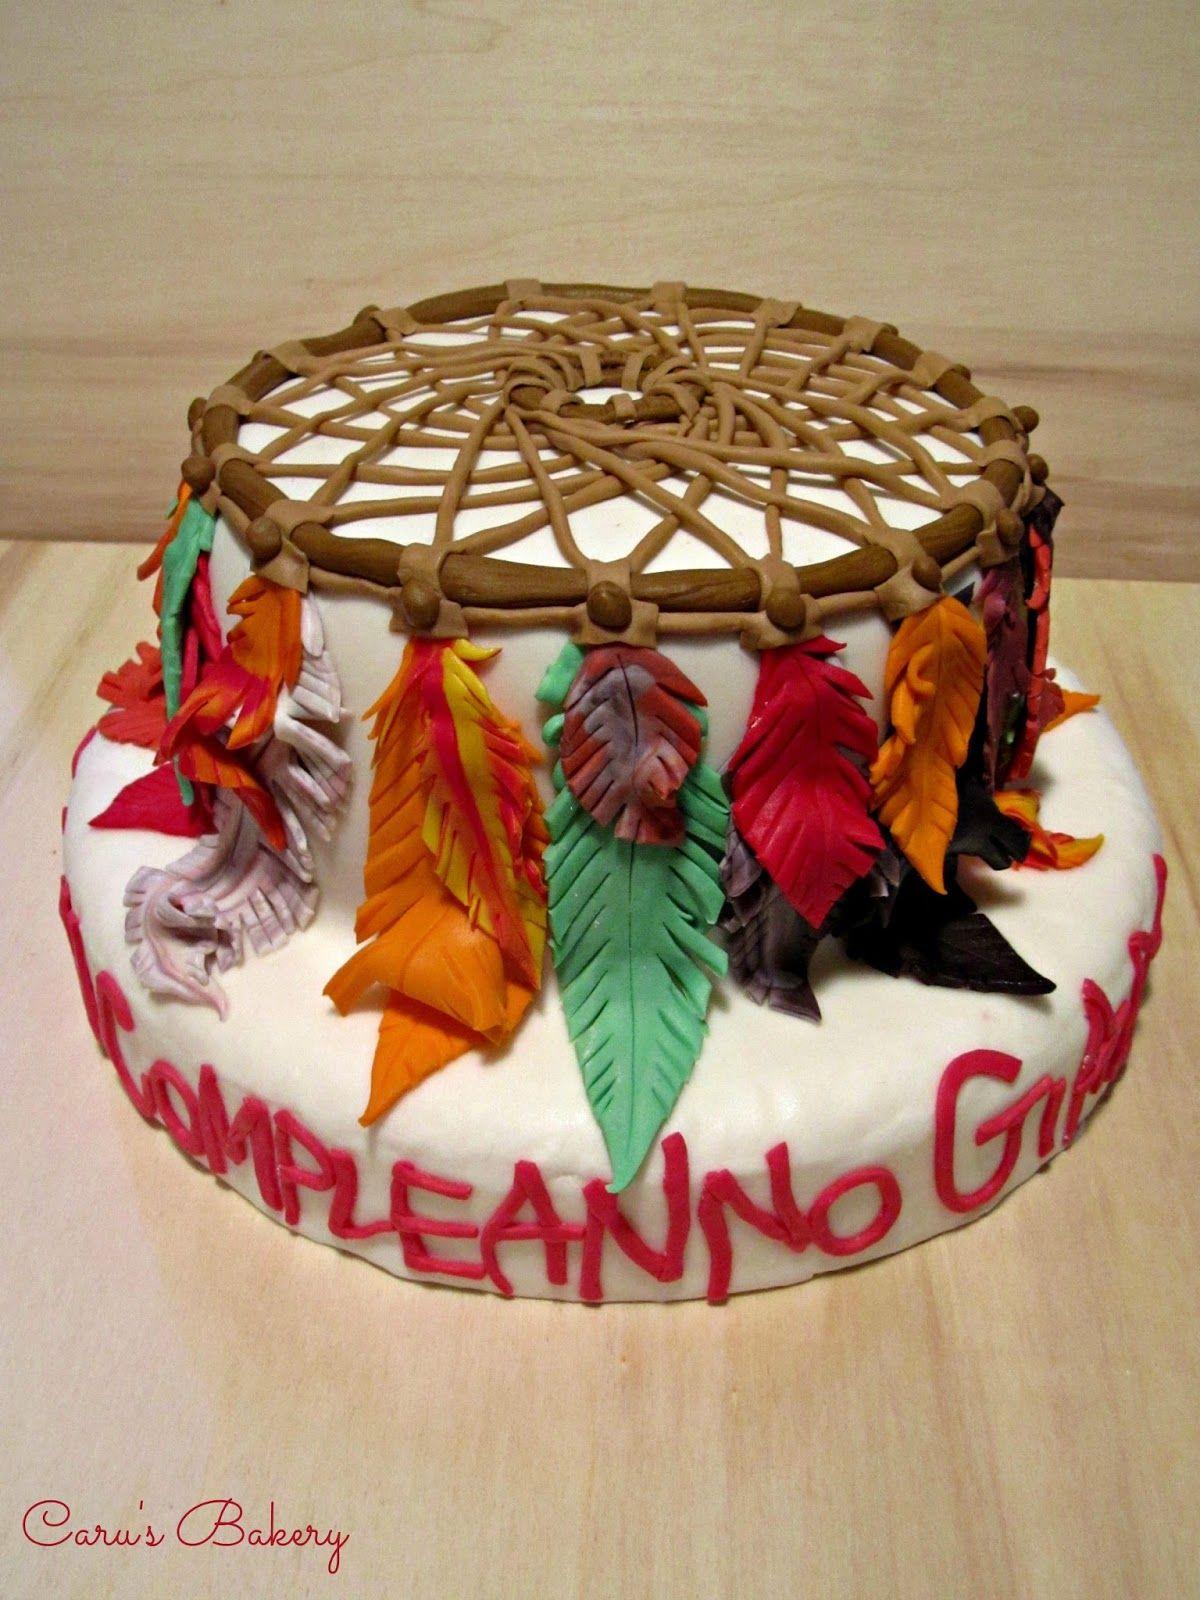 Caru's Bakery Dreamcatcher Cake Torte